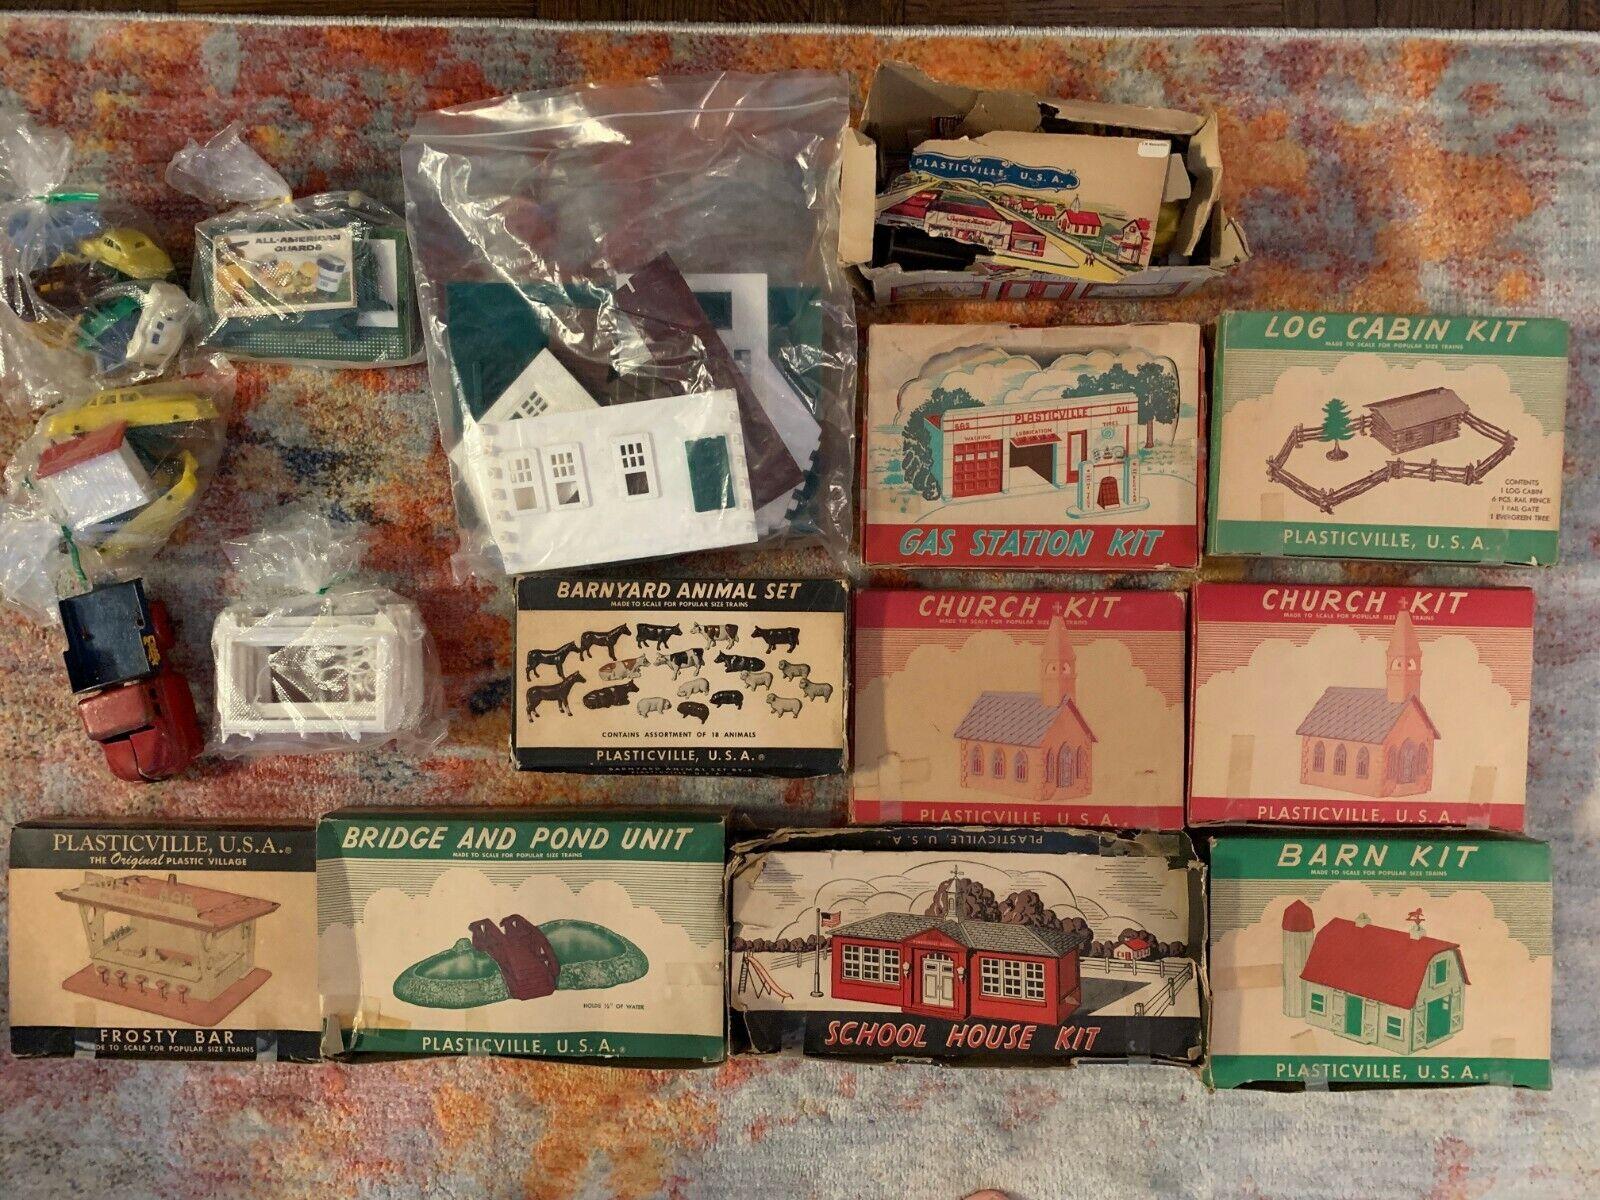 Sammlung of Jahr Plasticville, USA Items (9 kits total, plus other items)